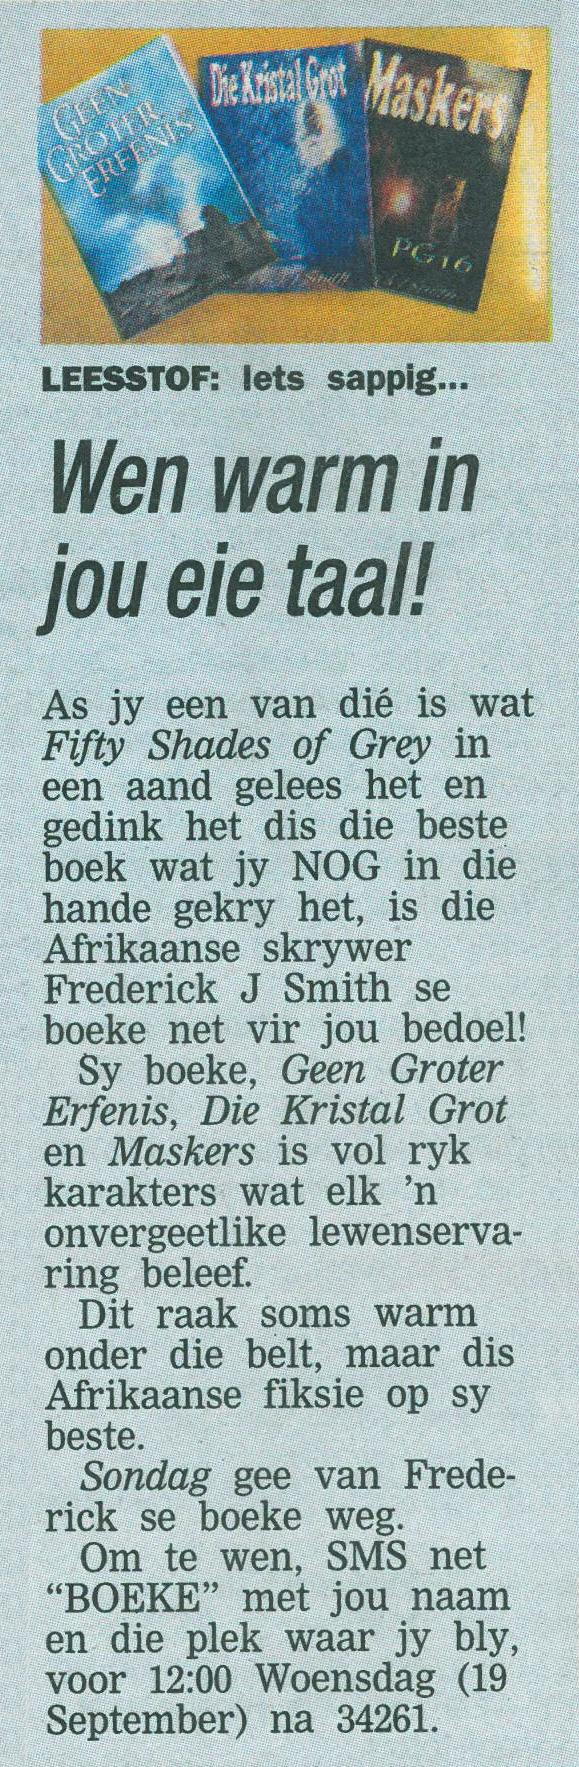 Editorial by Sondag newspaper.